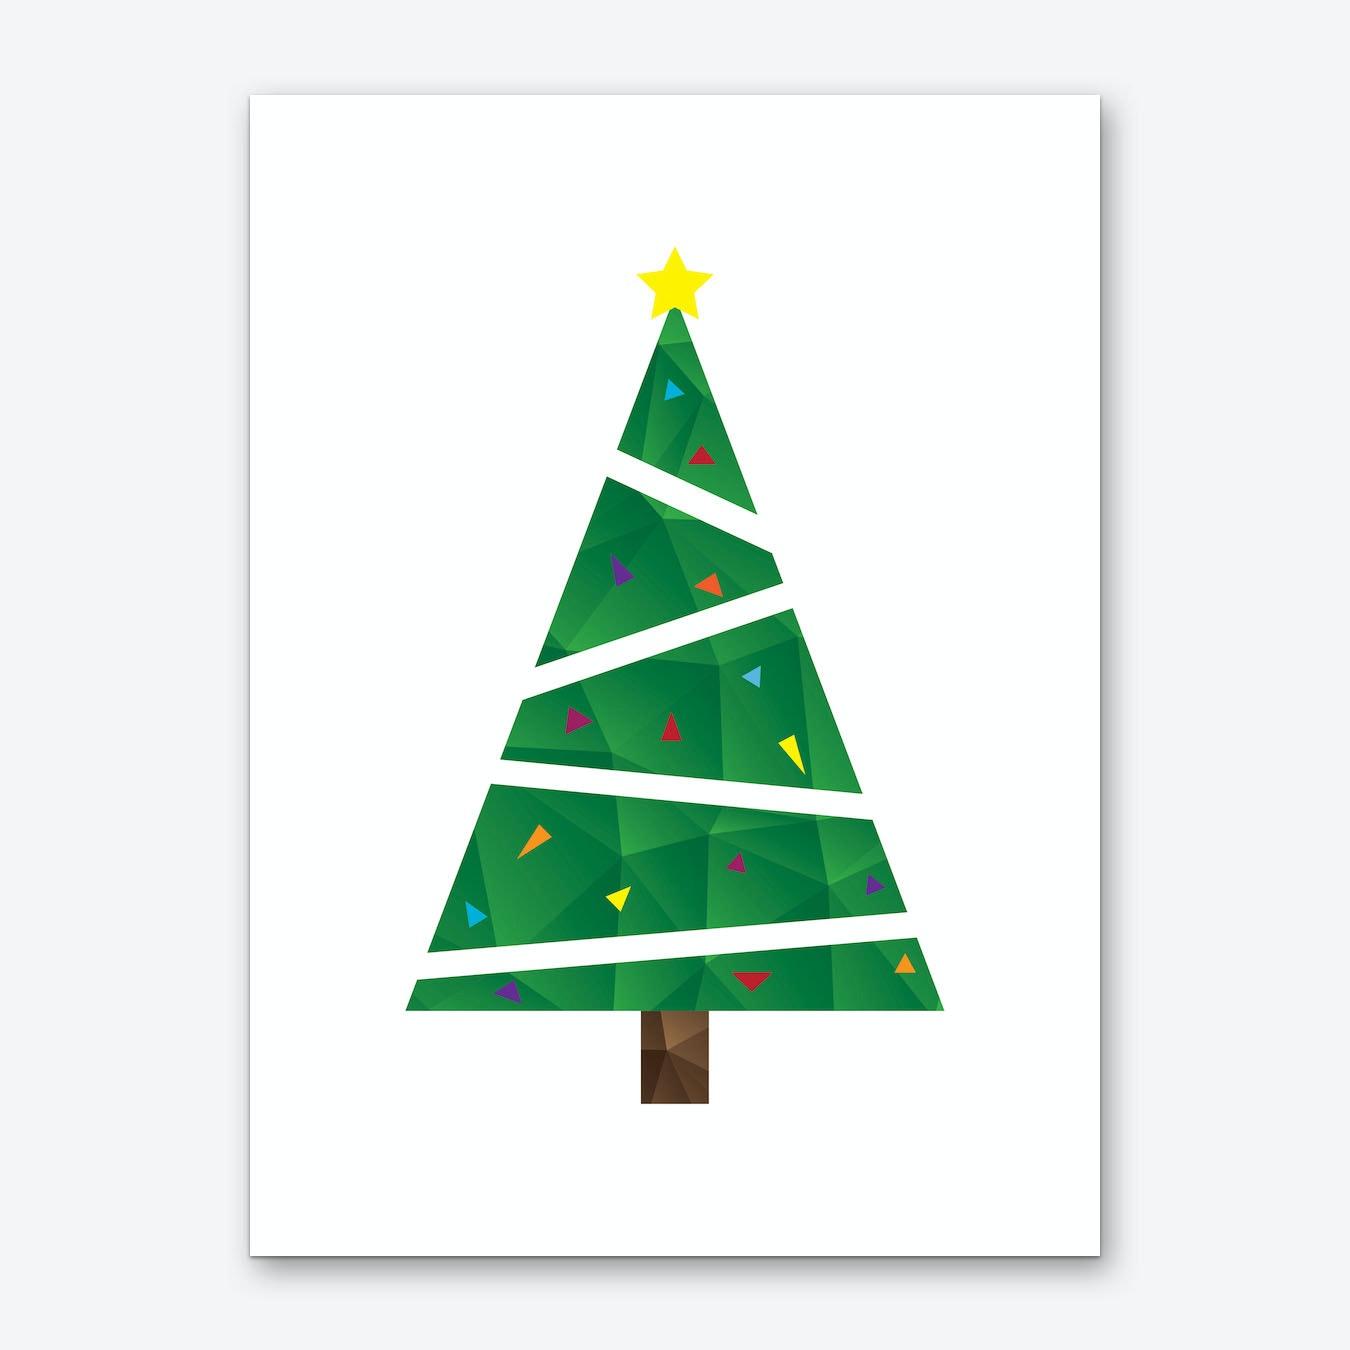 Christmas Pictures To Print.Oh Christmas Tree Holiday Art Print